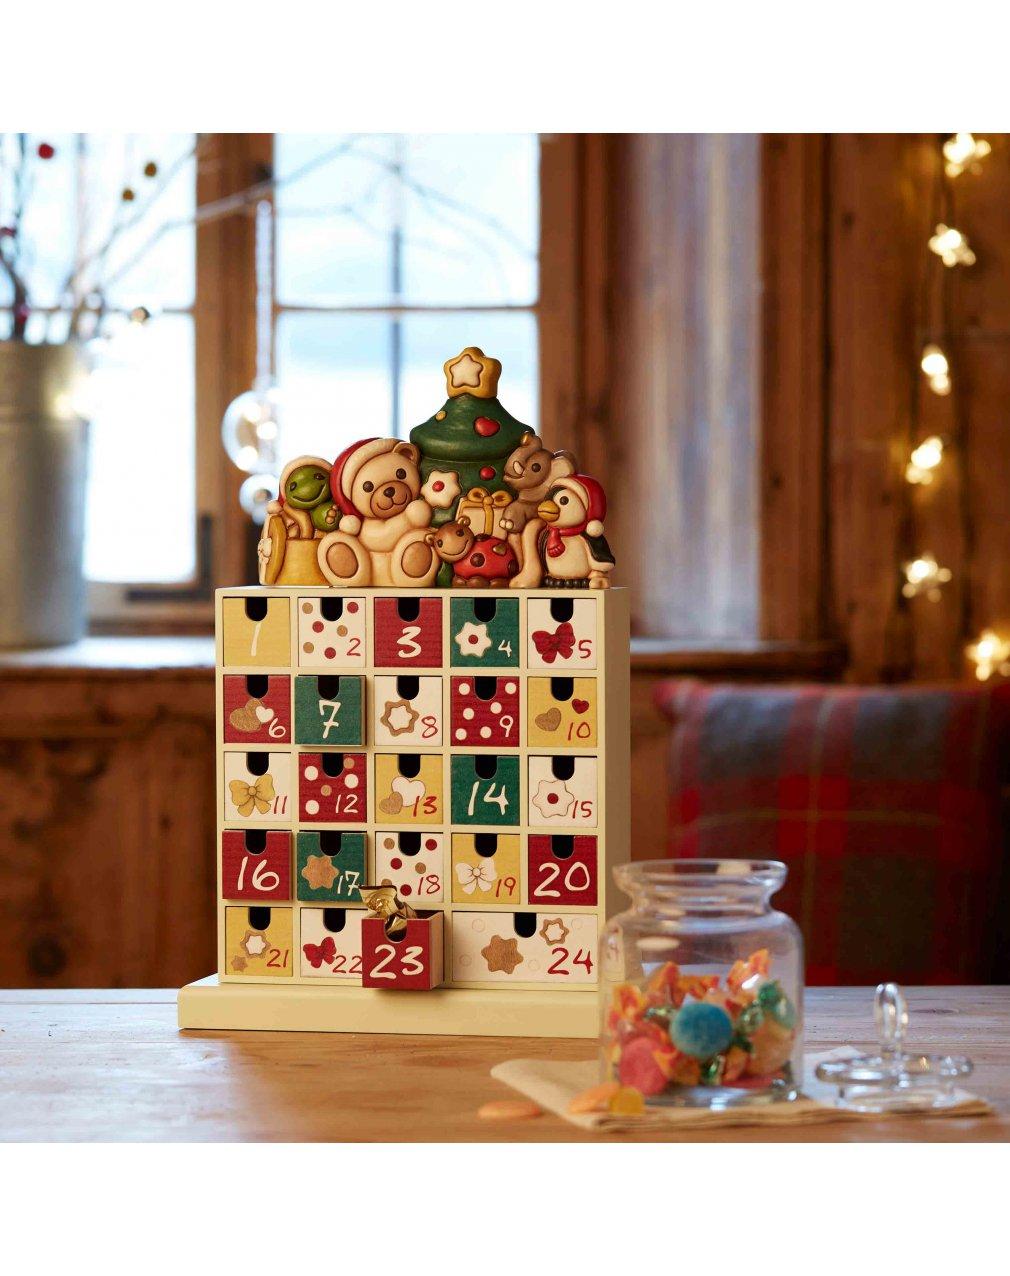 Novita catalogo Thun Natale 2018 Calendario Avvento